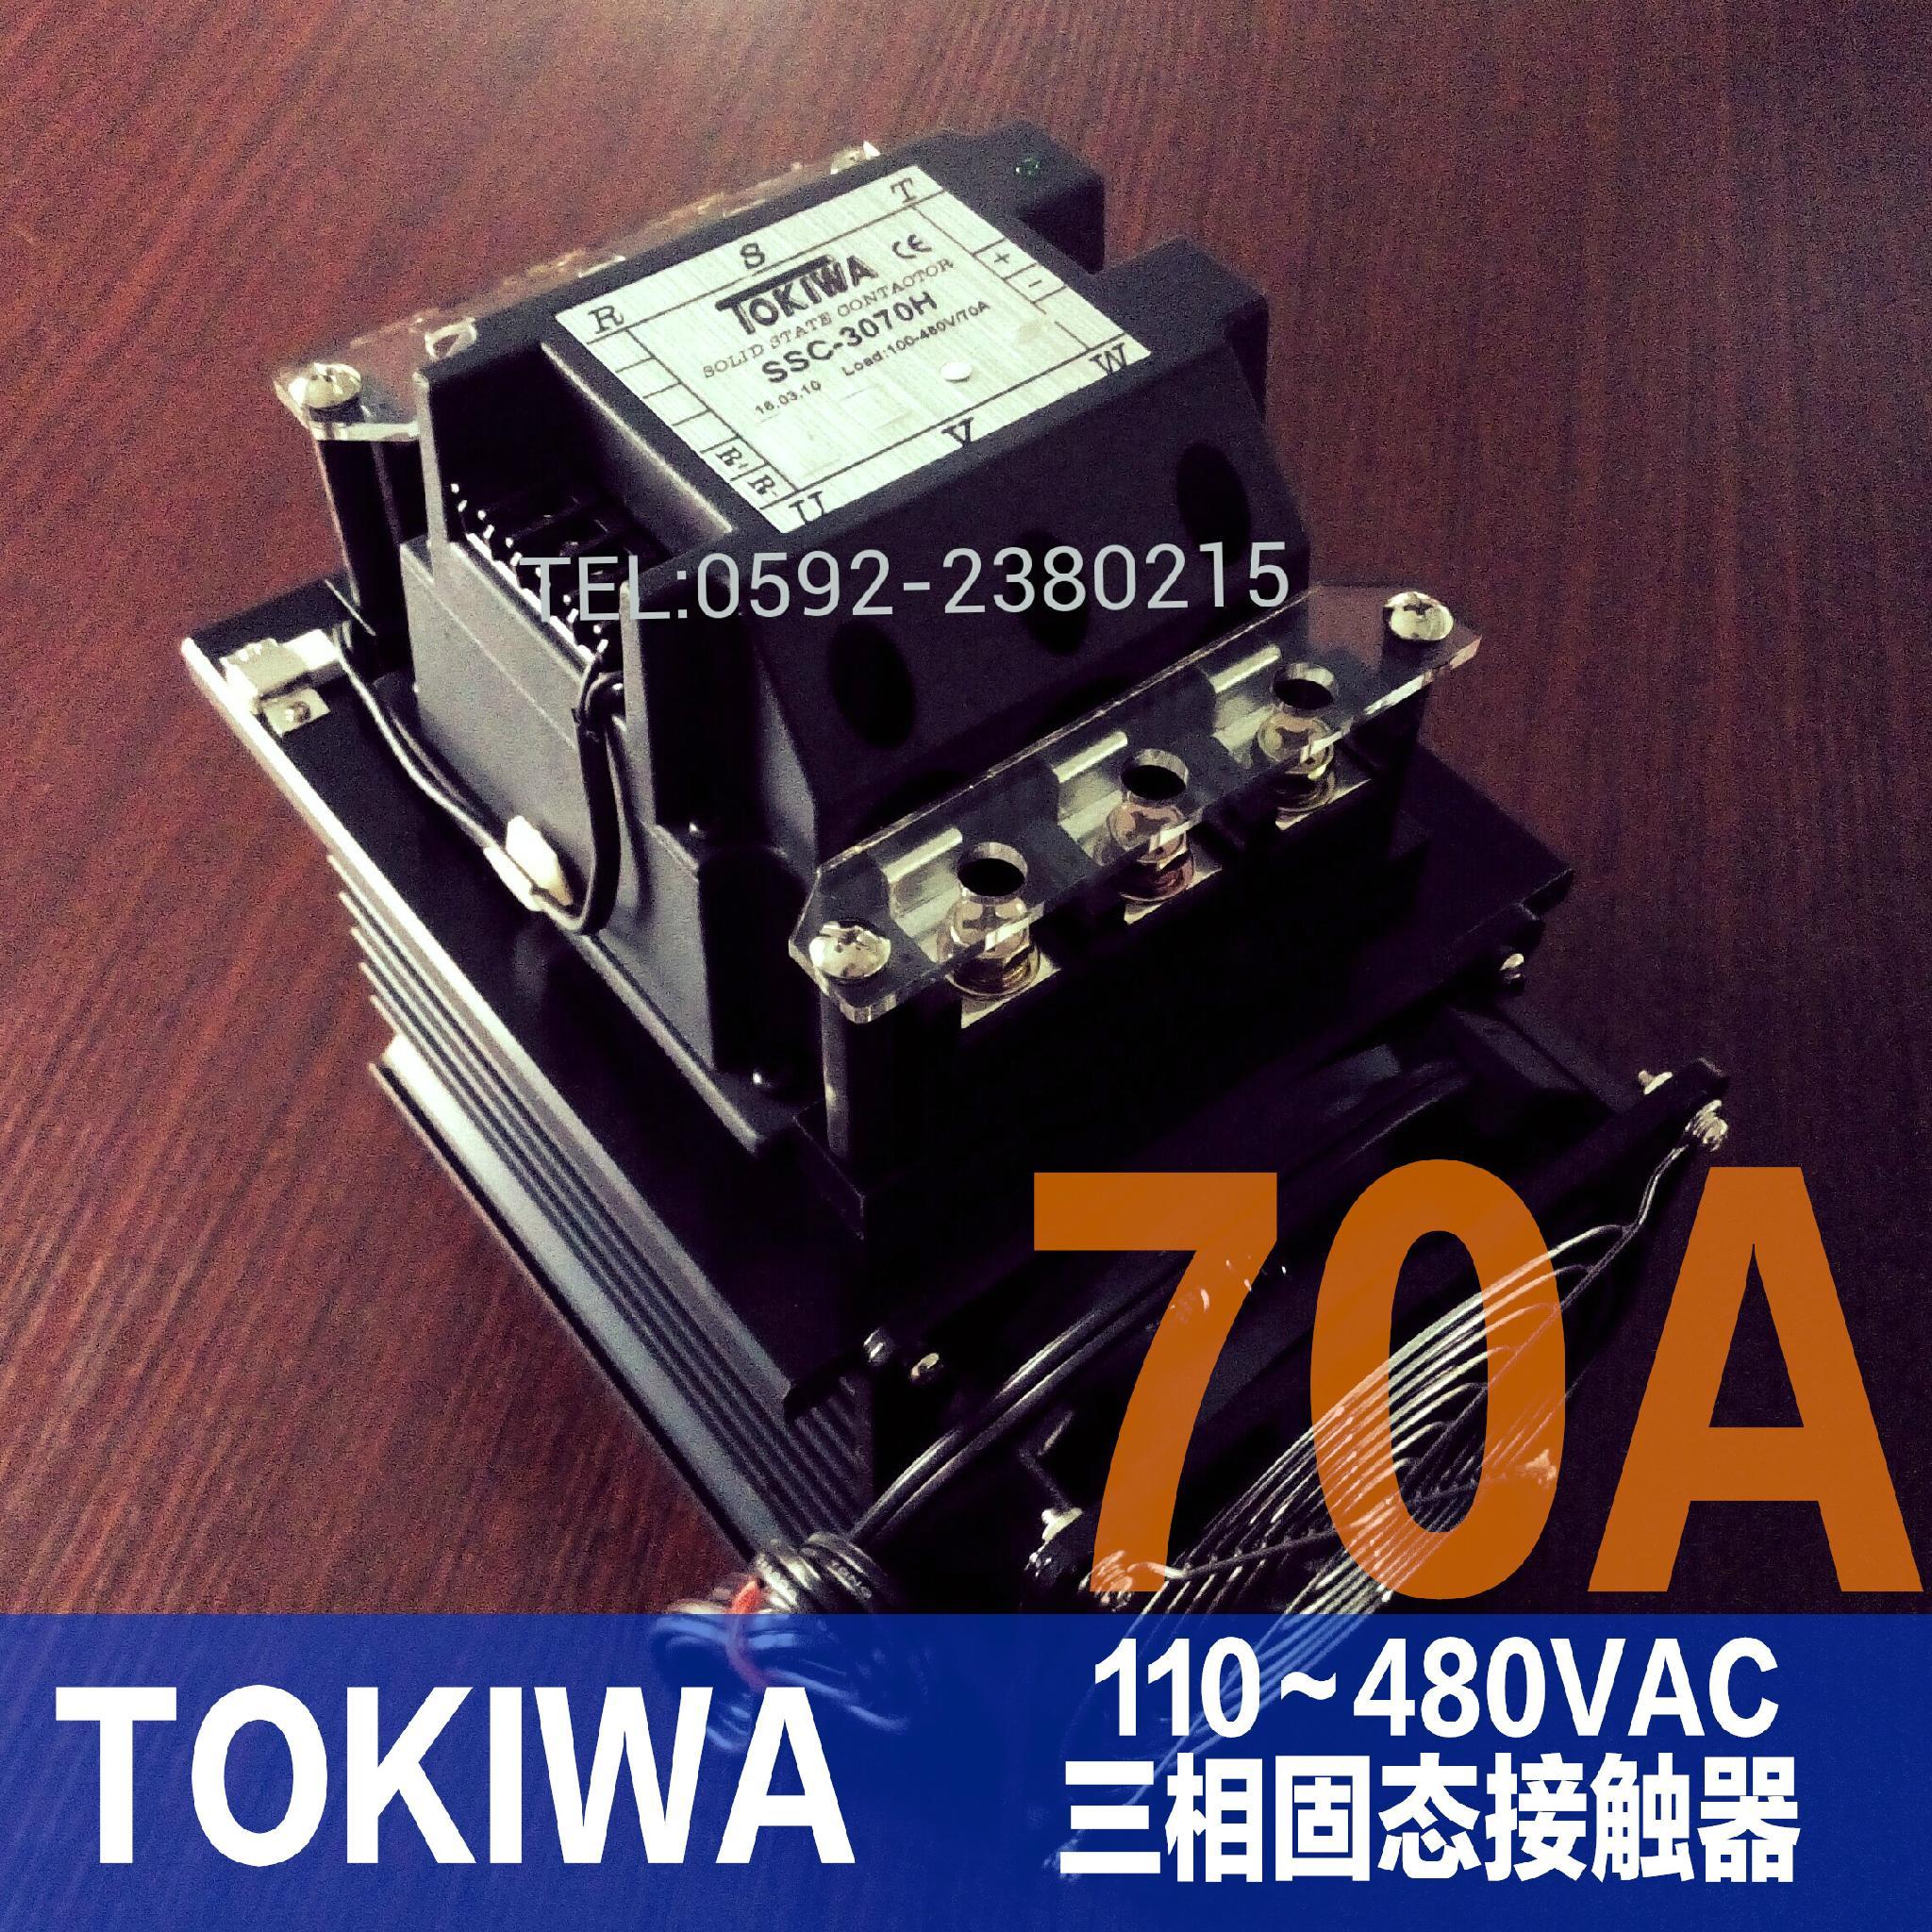 TOKIWA TOPTAWA SSC-3070HL